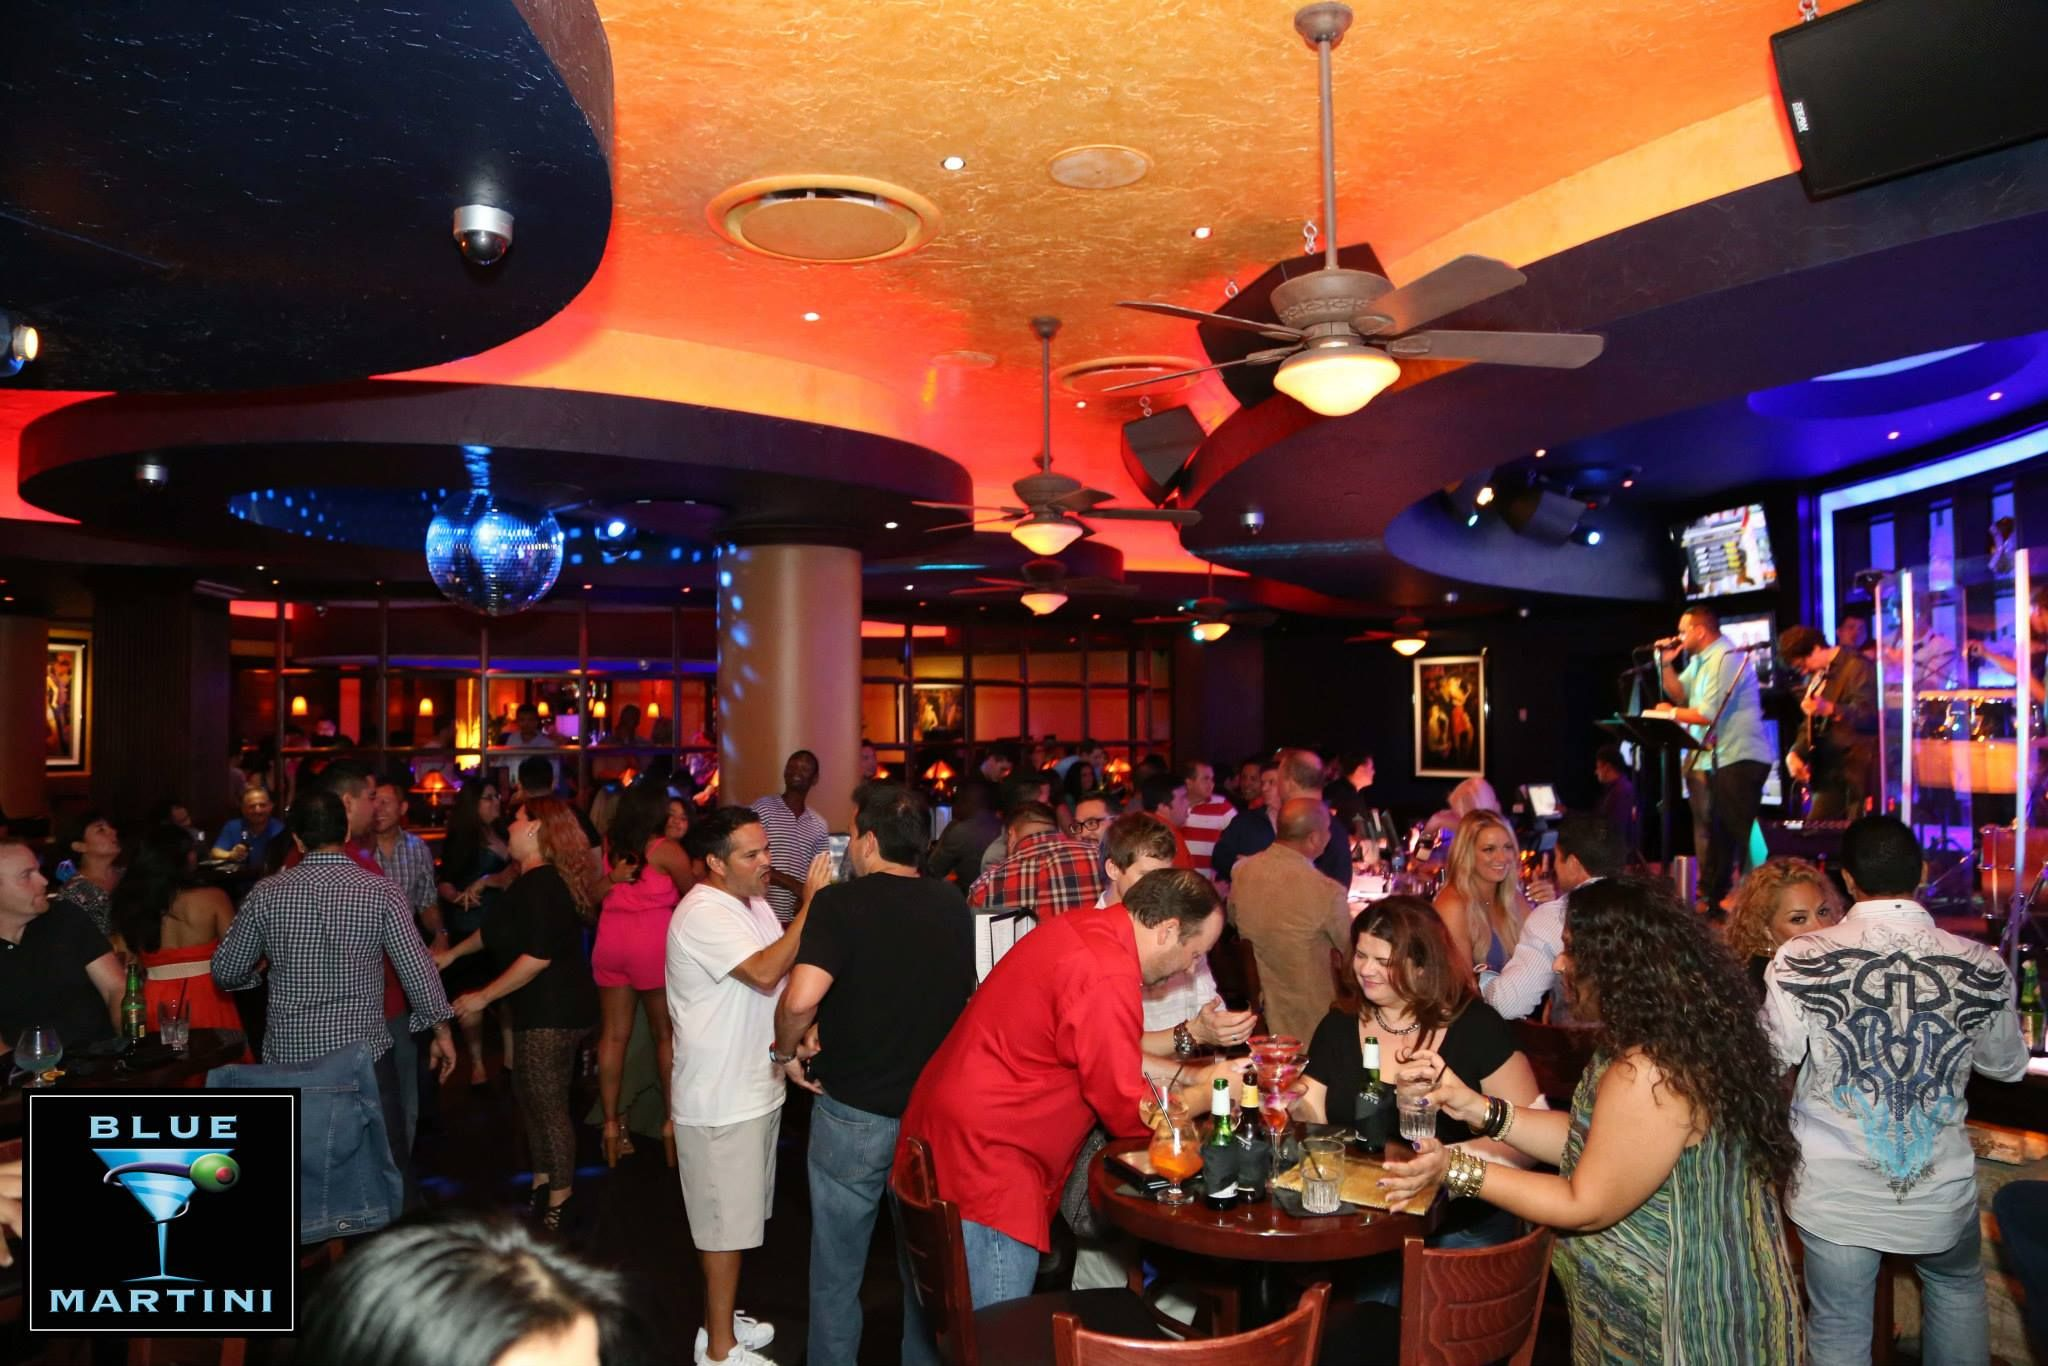 Blue Martini International Night Thursdays Blue Martini Nightlife Club Plano